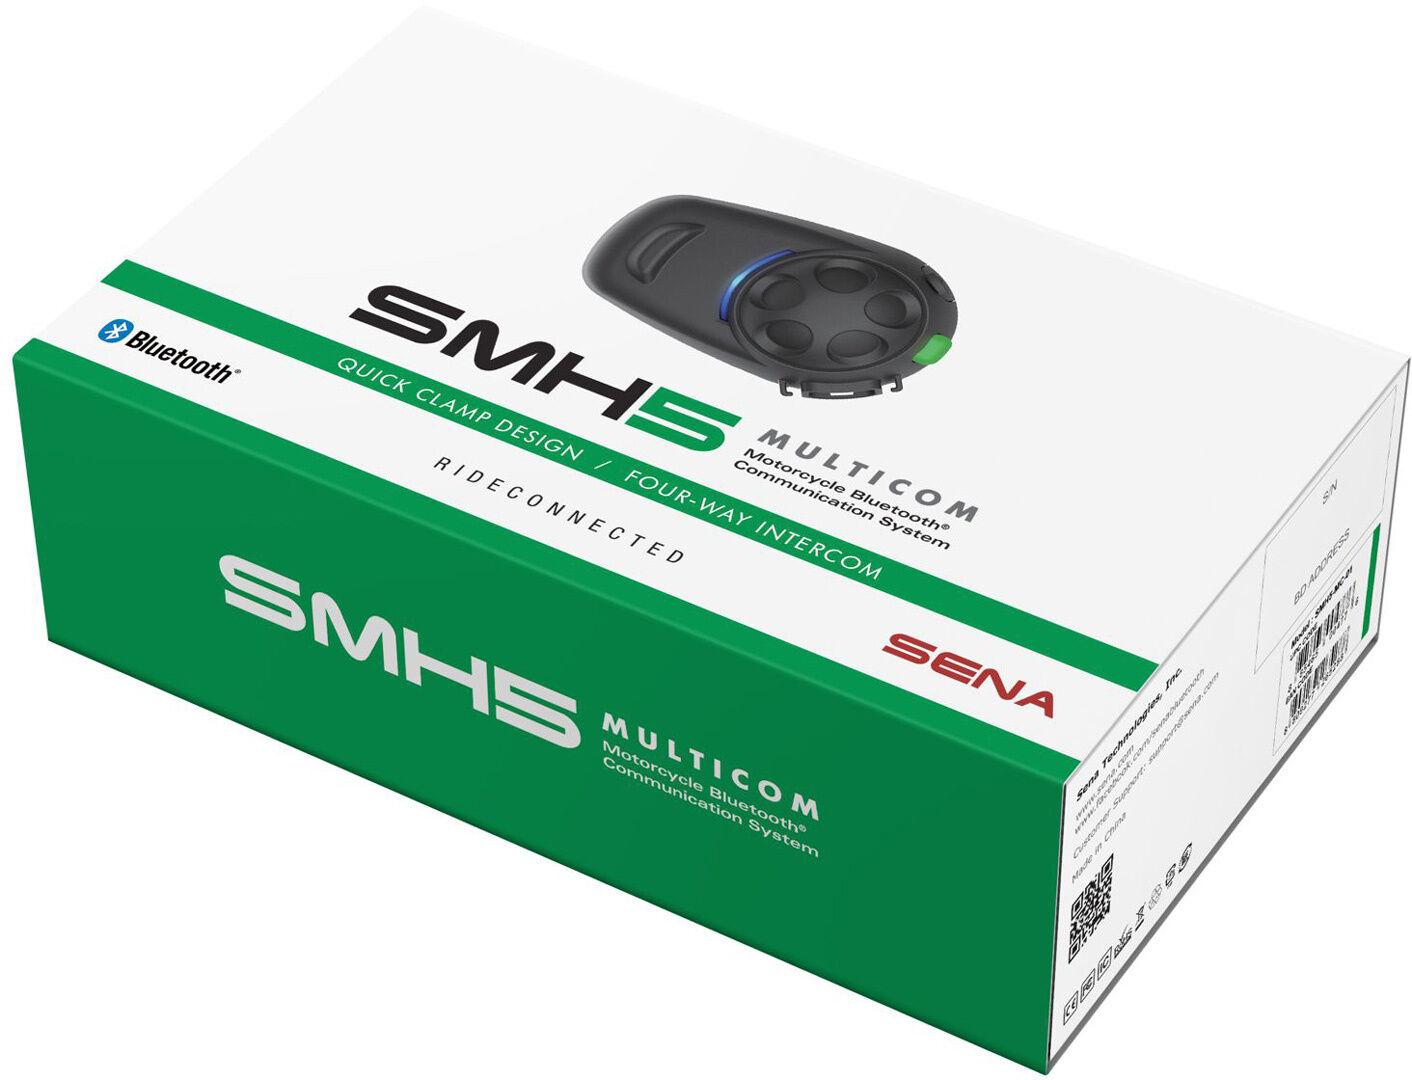 Sena SMH5 Multicom Bluetooth Communication System Single Pack Pacch... Nero unica taglia